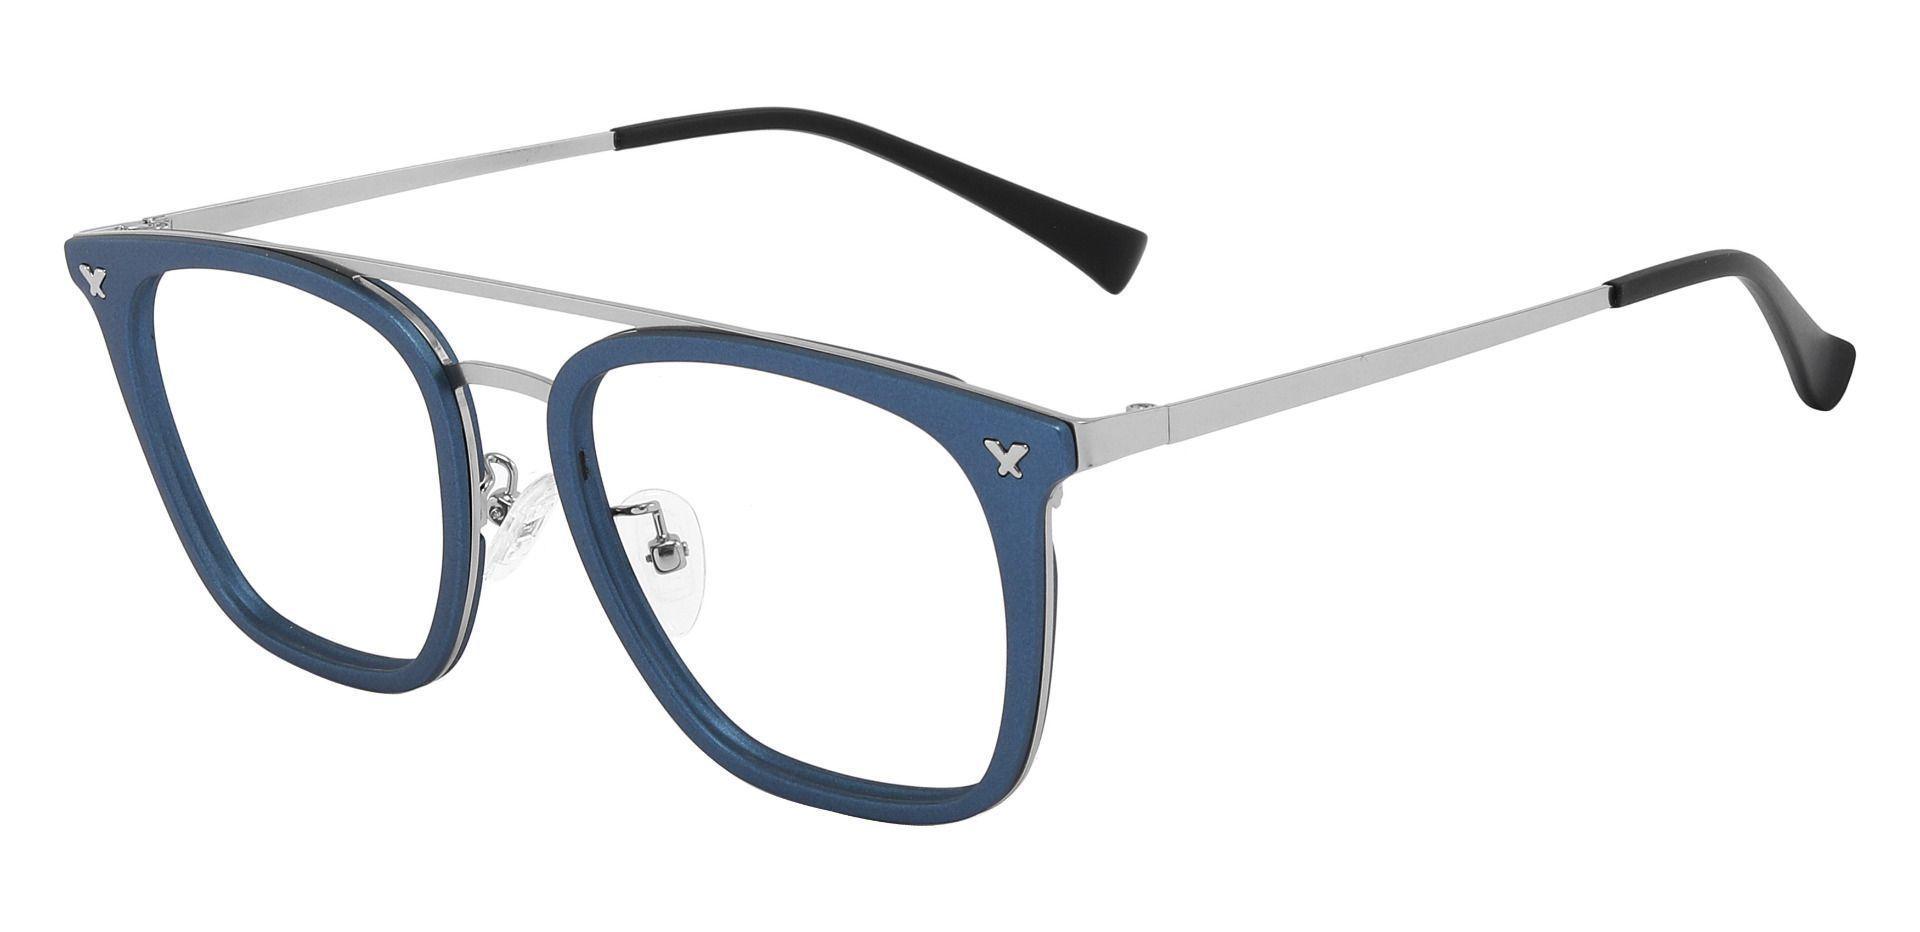 Francois Aviator Prescription Glasses - Blue